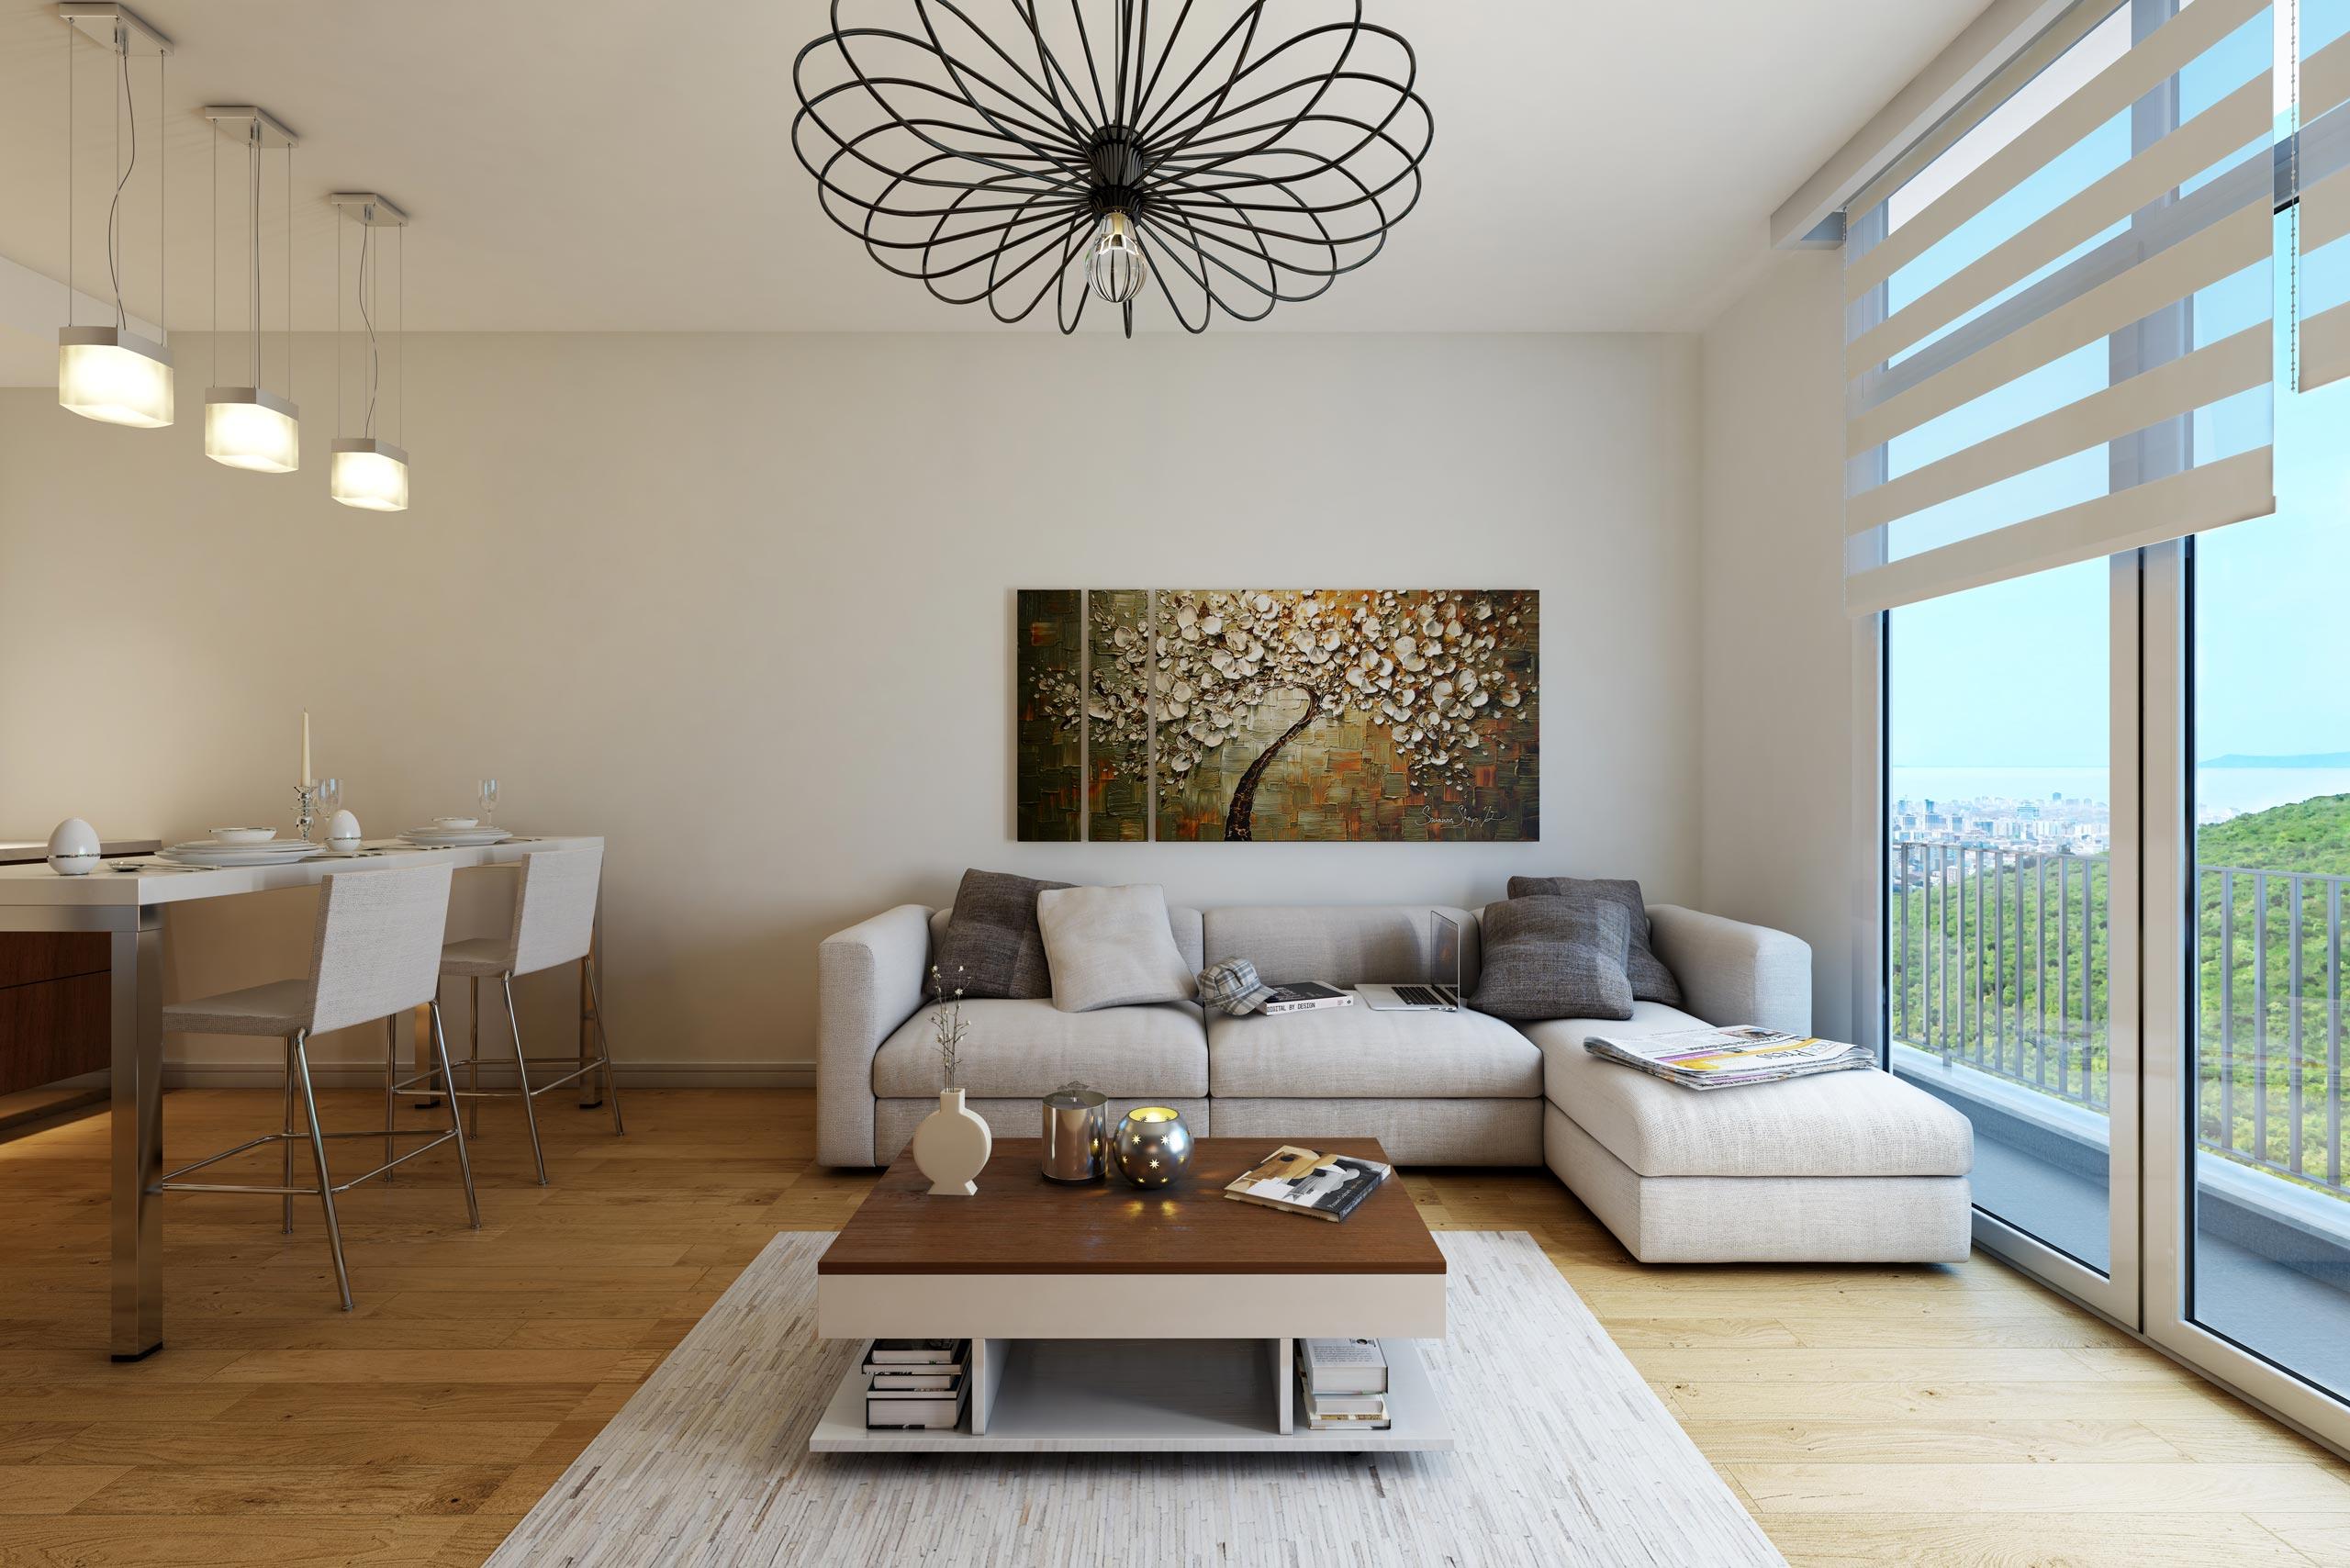 Architectural-visualisation-Dorset-London-Tepe-Insaat-Narlife-03